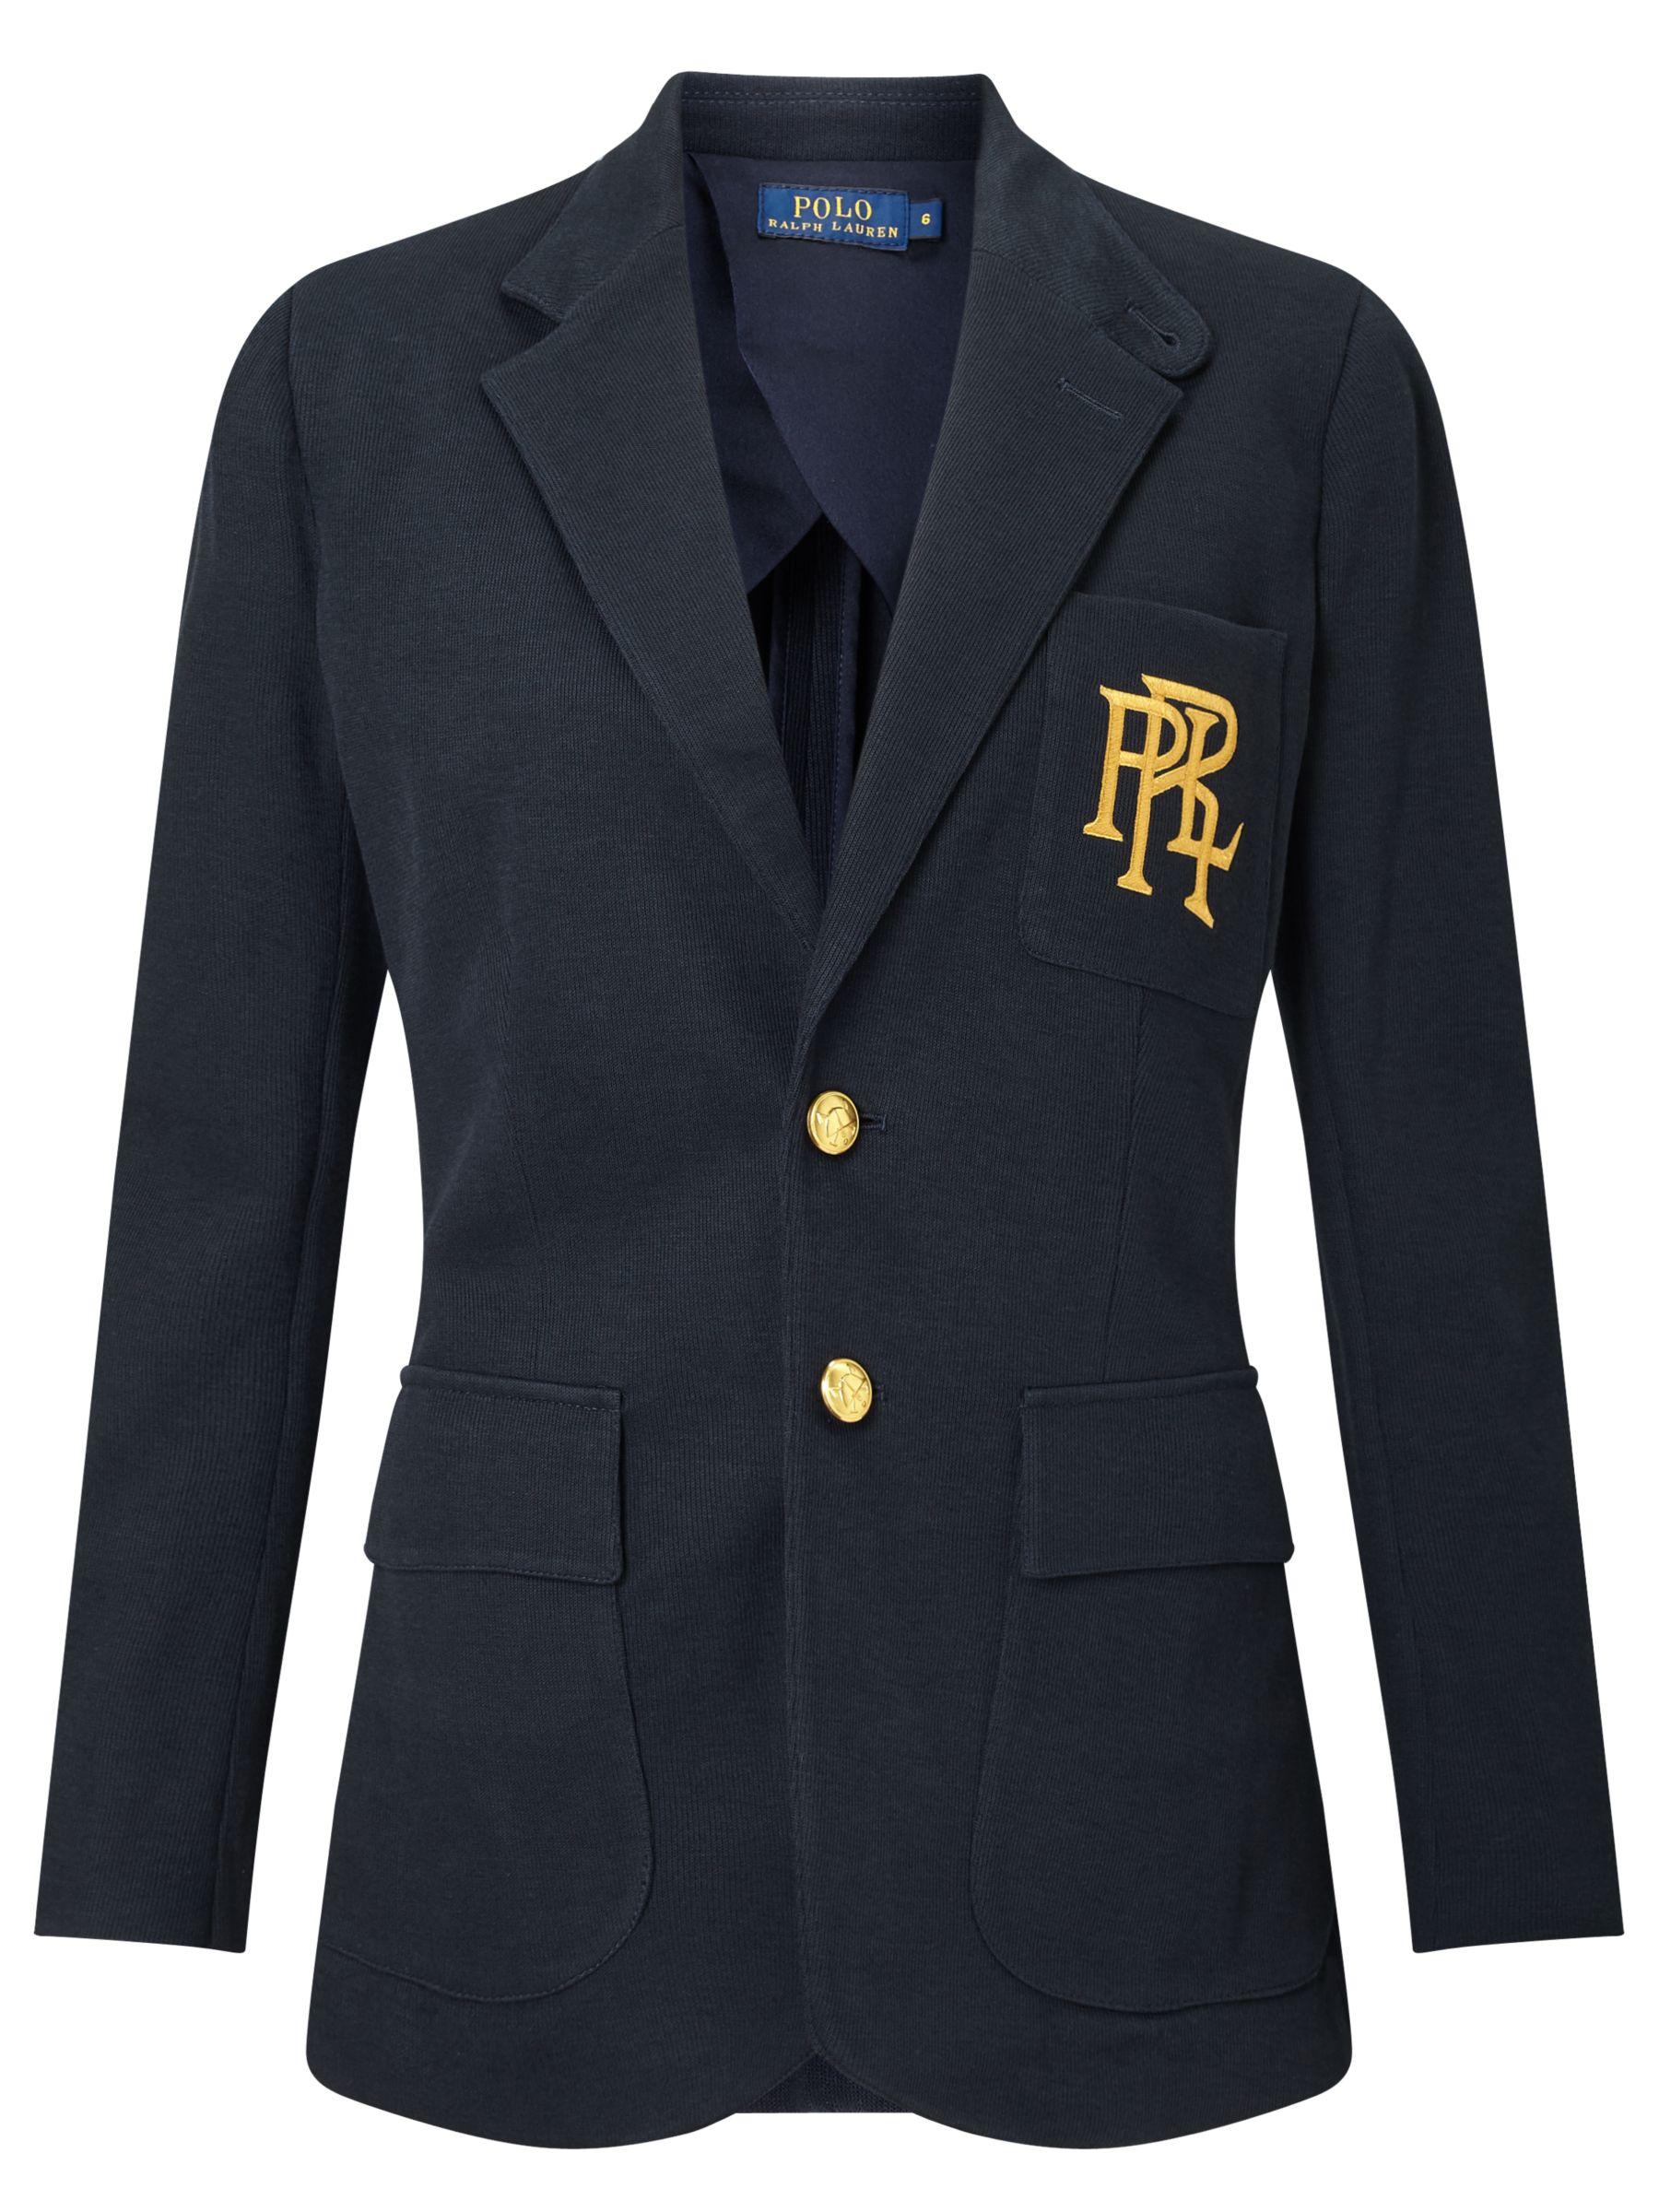 45f99932 Polo Ralph Lauren Knit Cotton Blazer at John Lewis & Partners